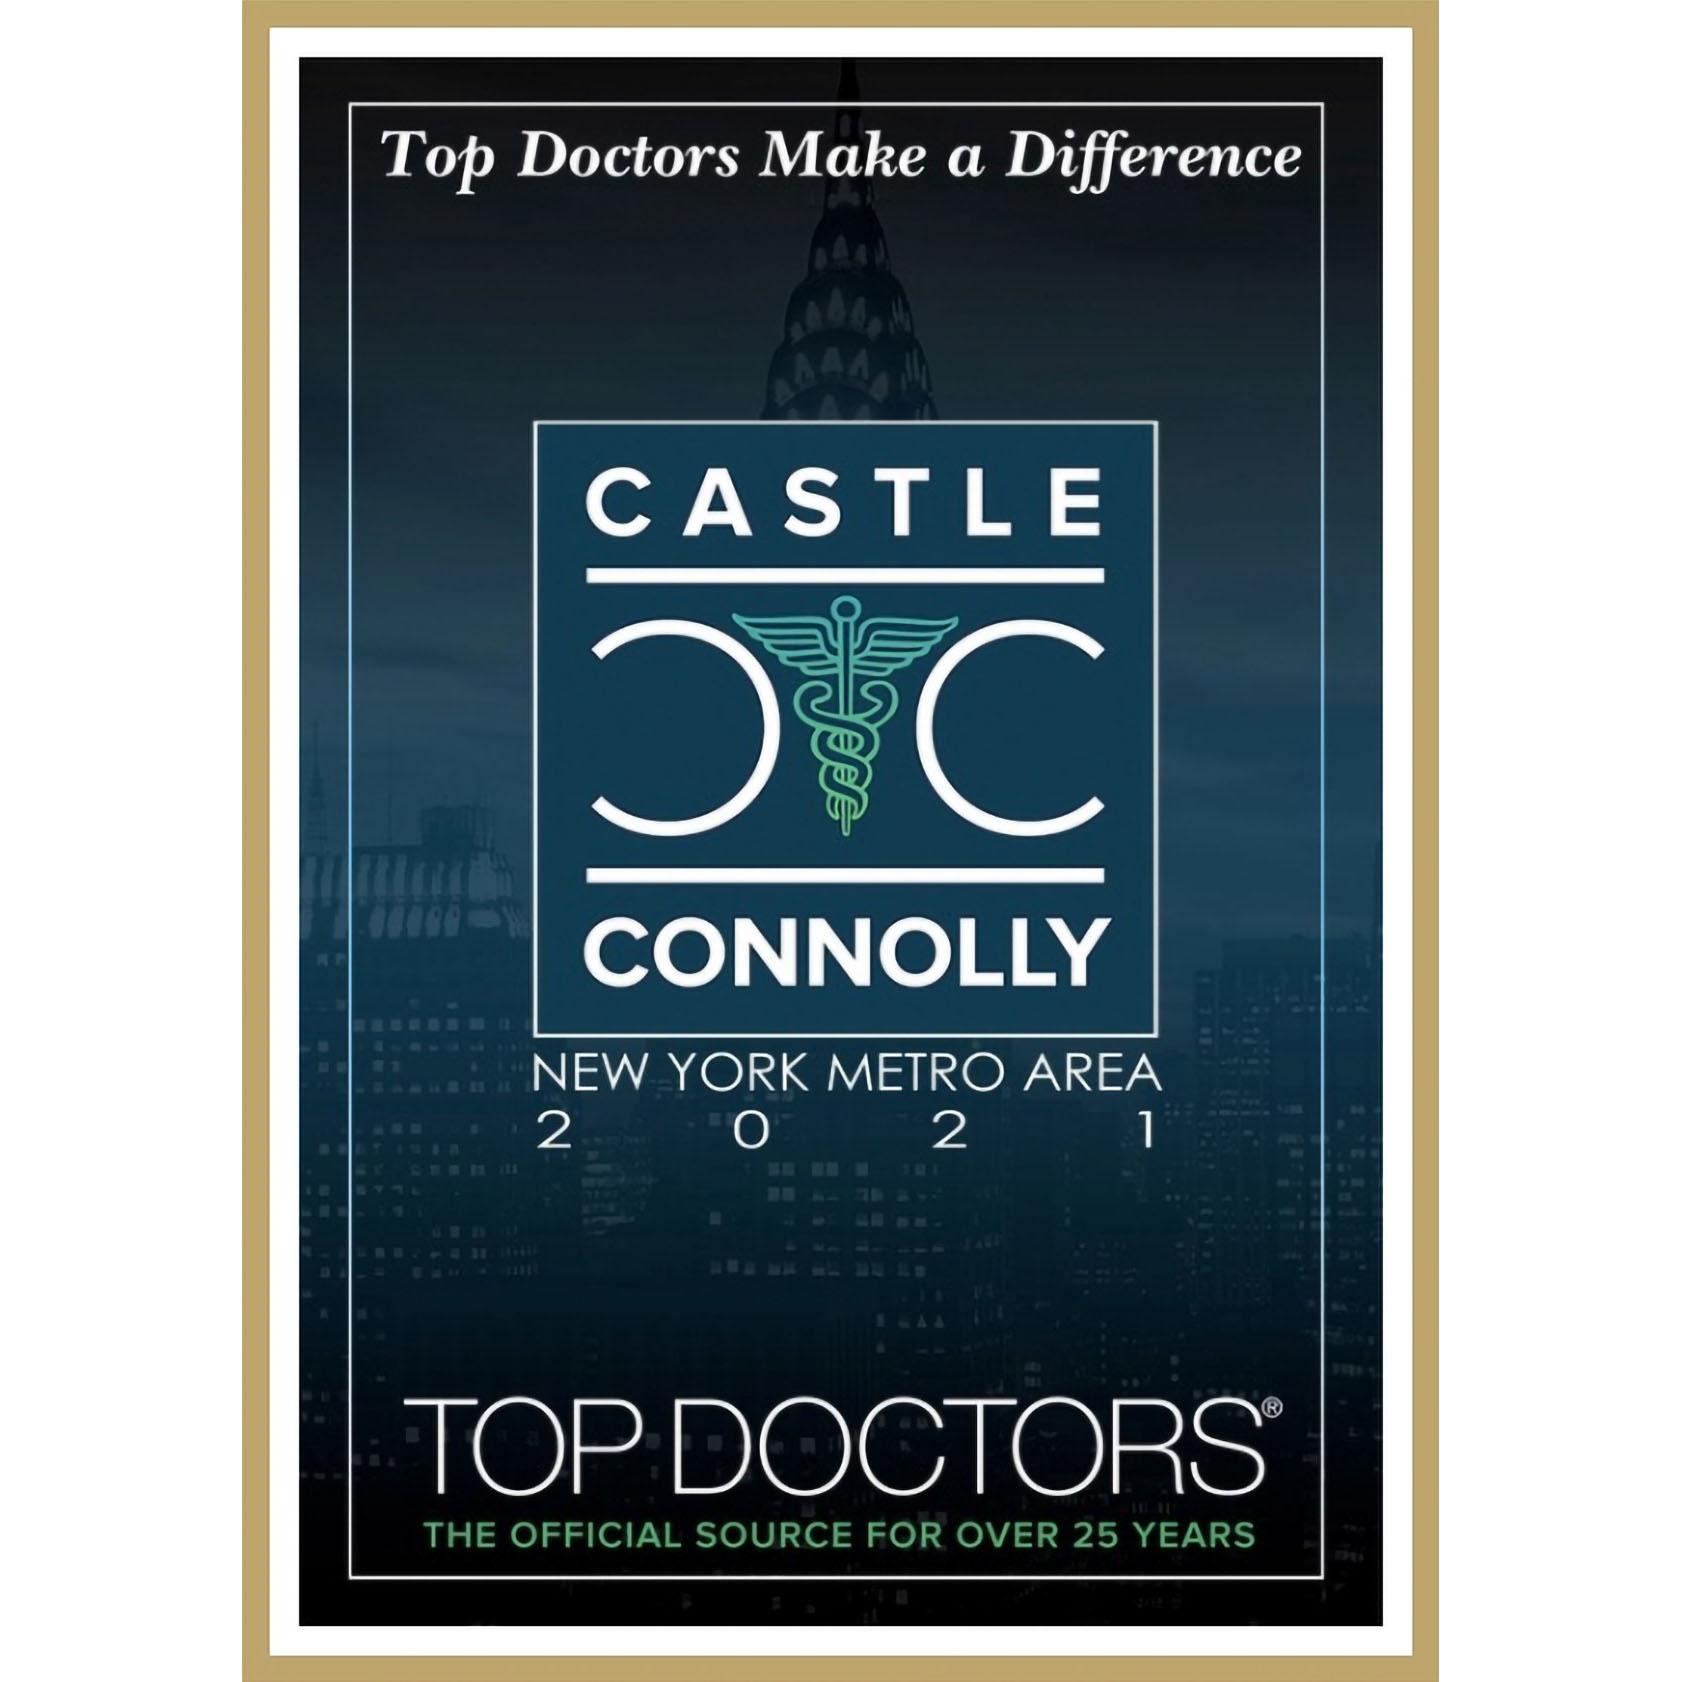 Castle Connolly Top Doctors NY Metro Area - 2021